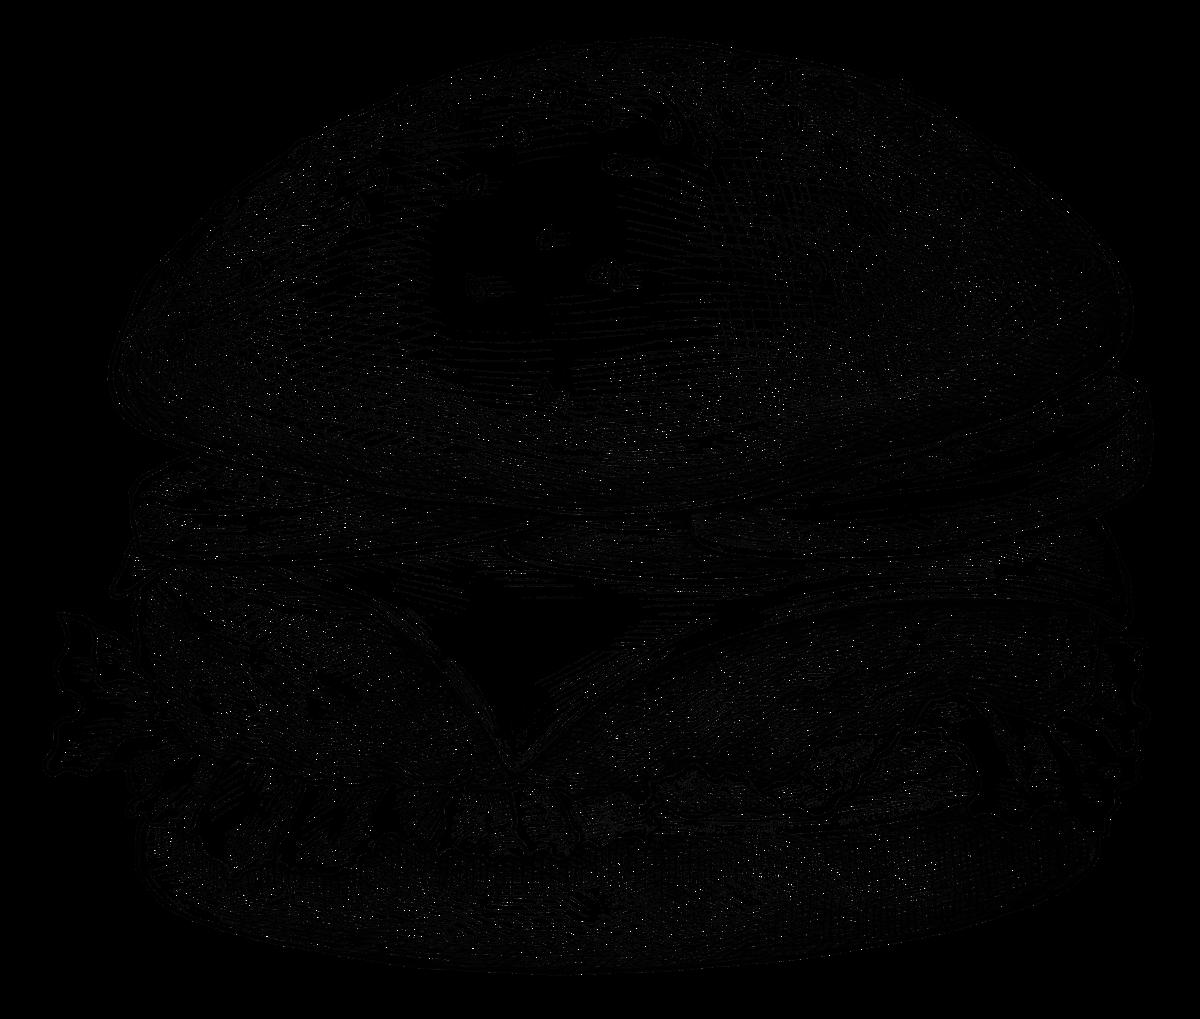 Hamburger Fast Food 2